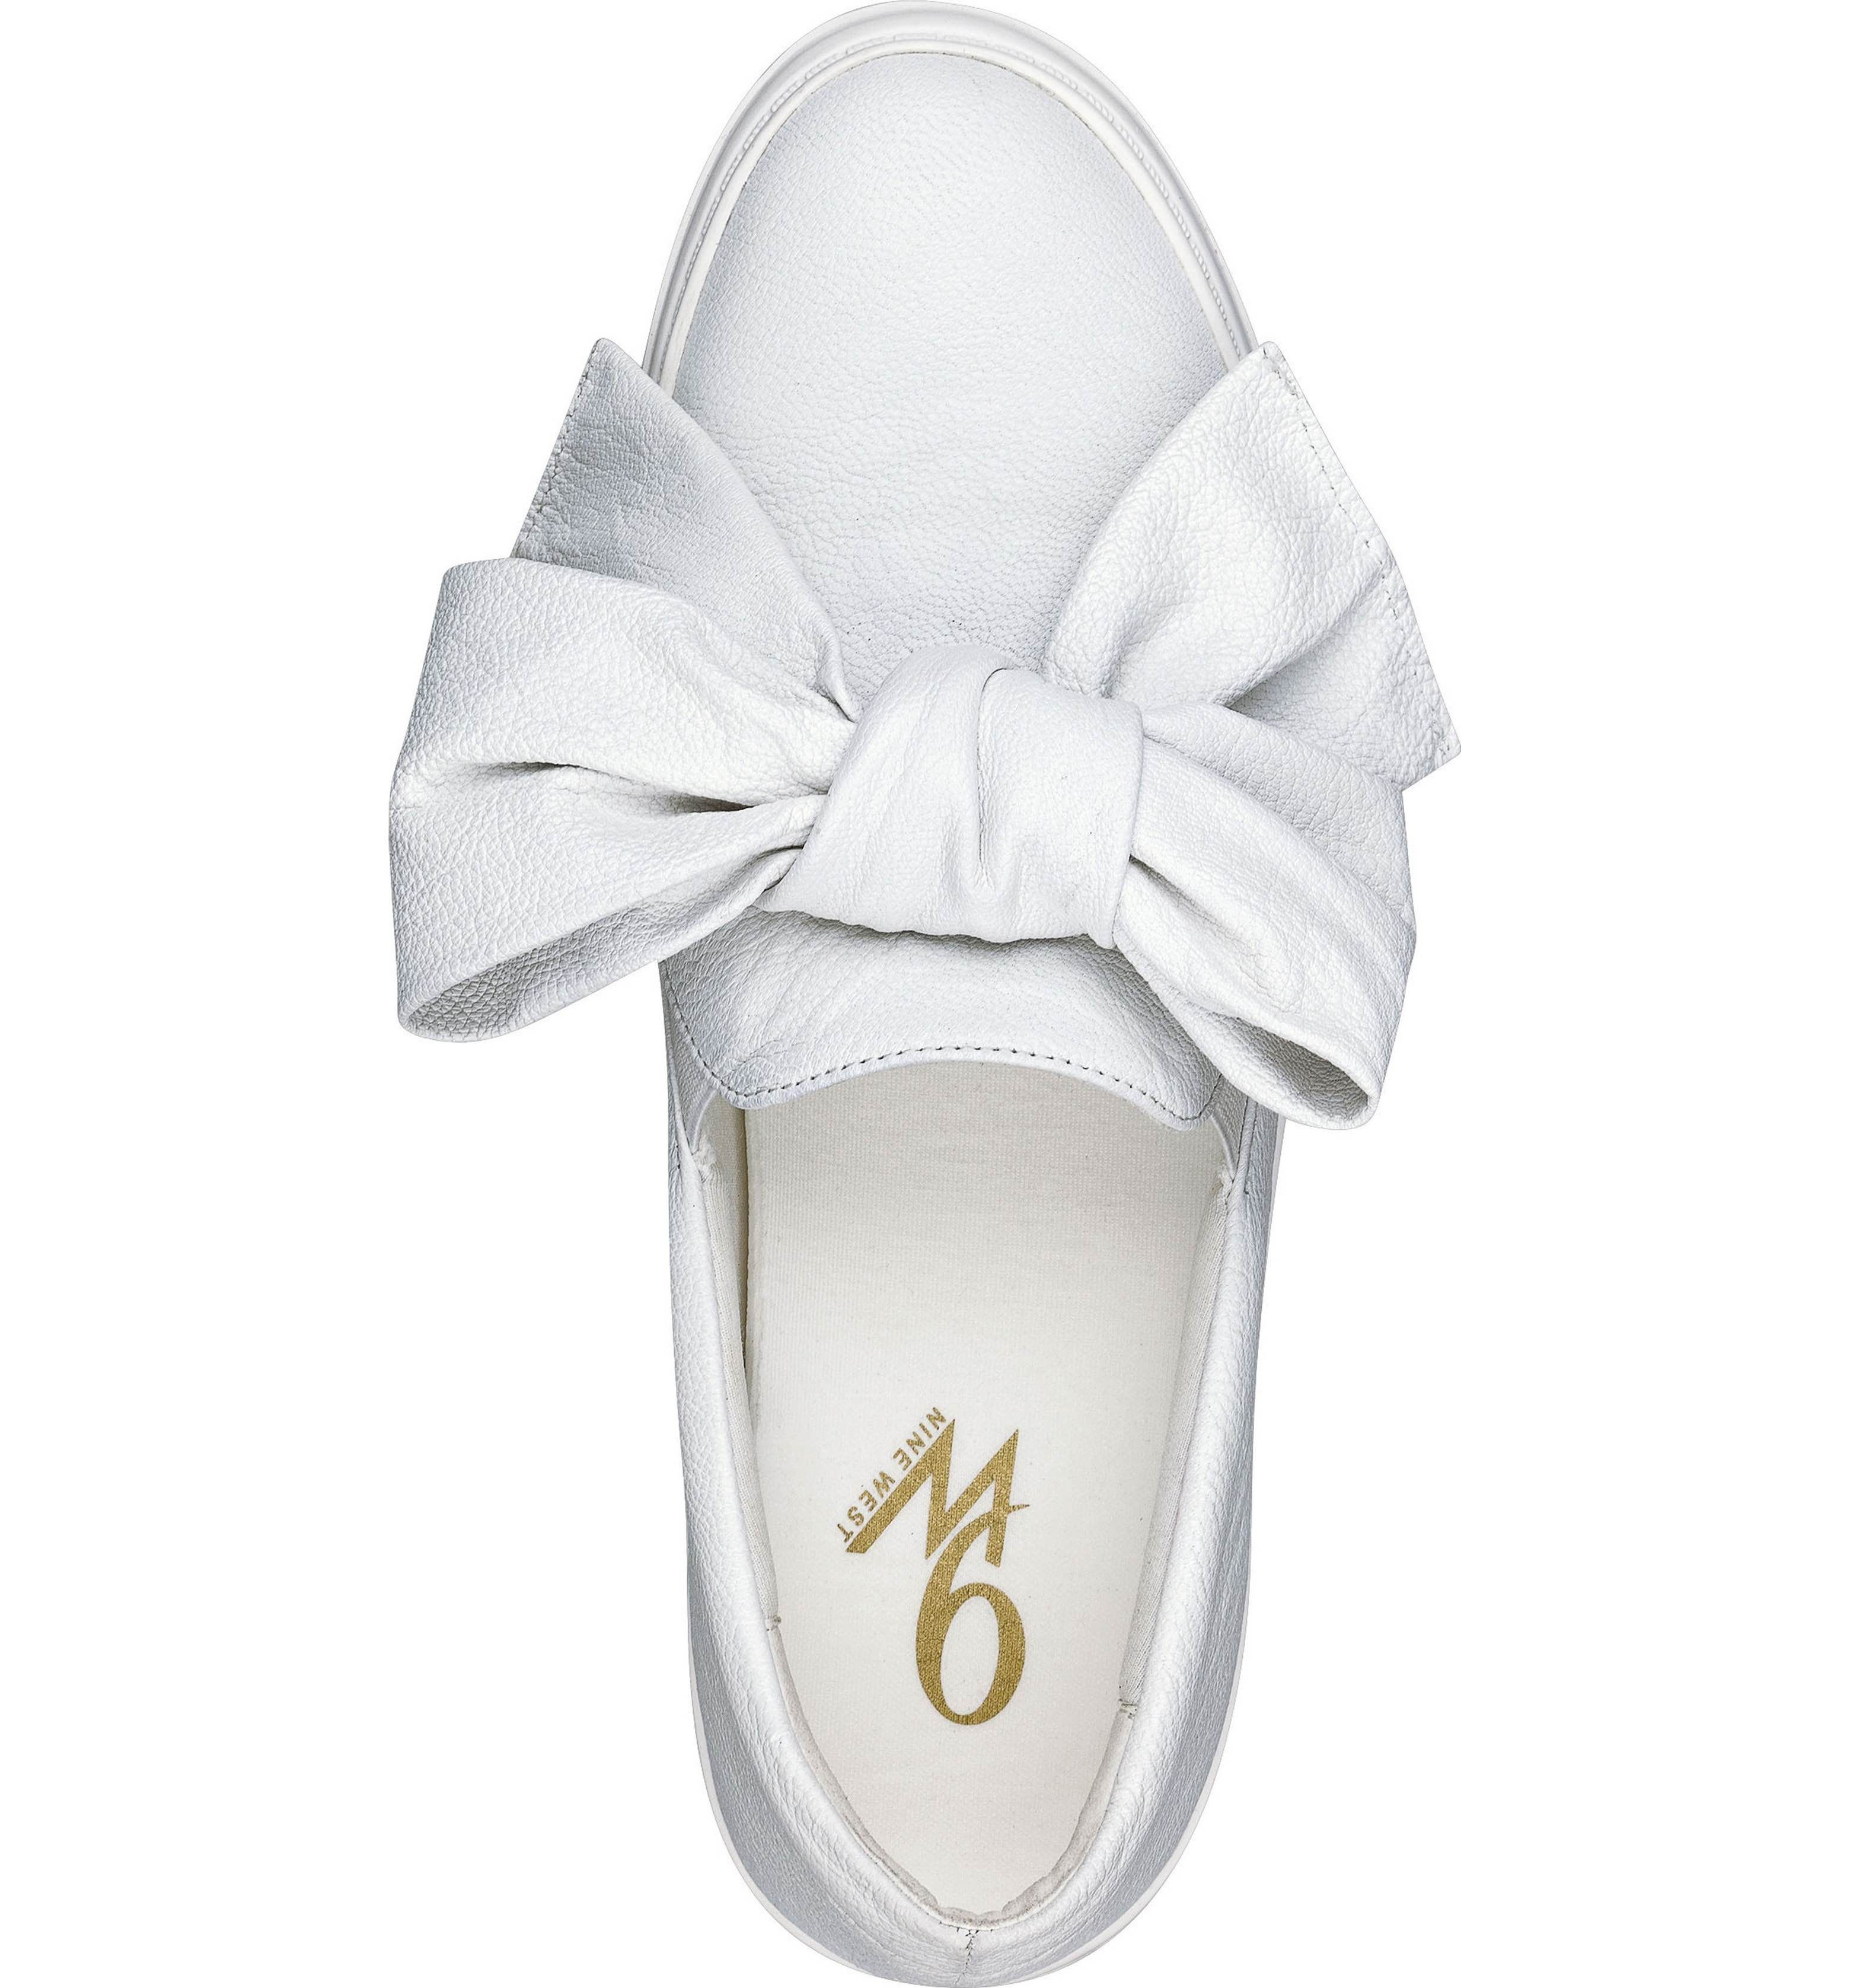 Nine West Onosha Bow Slip-On Sneaker